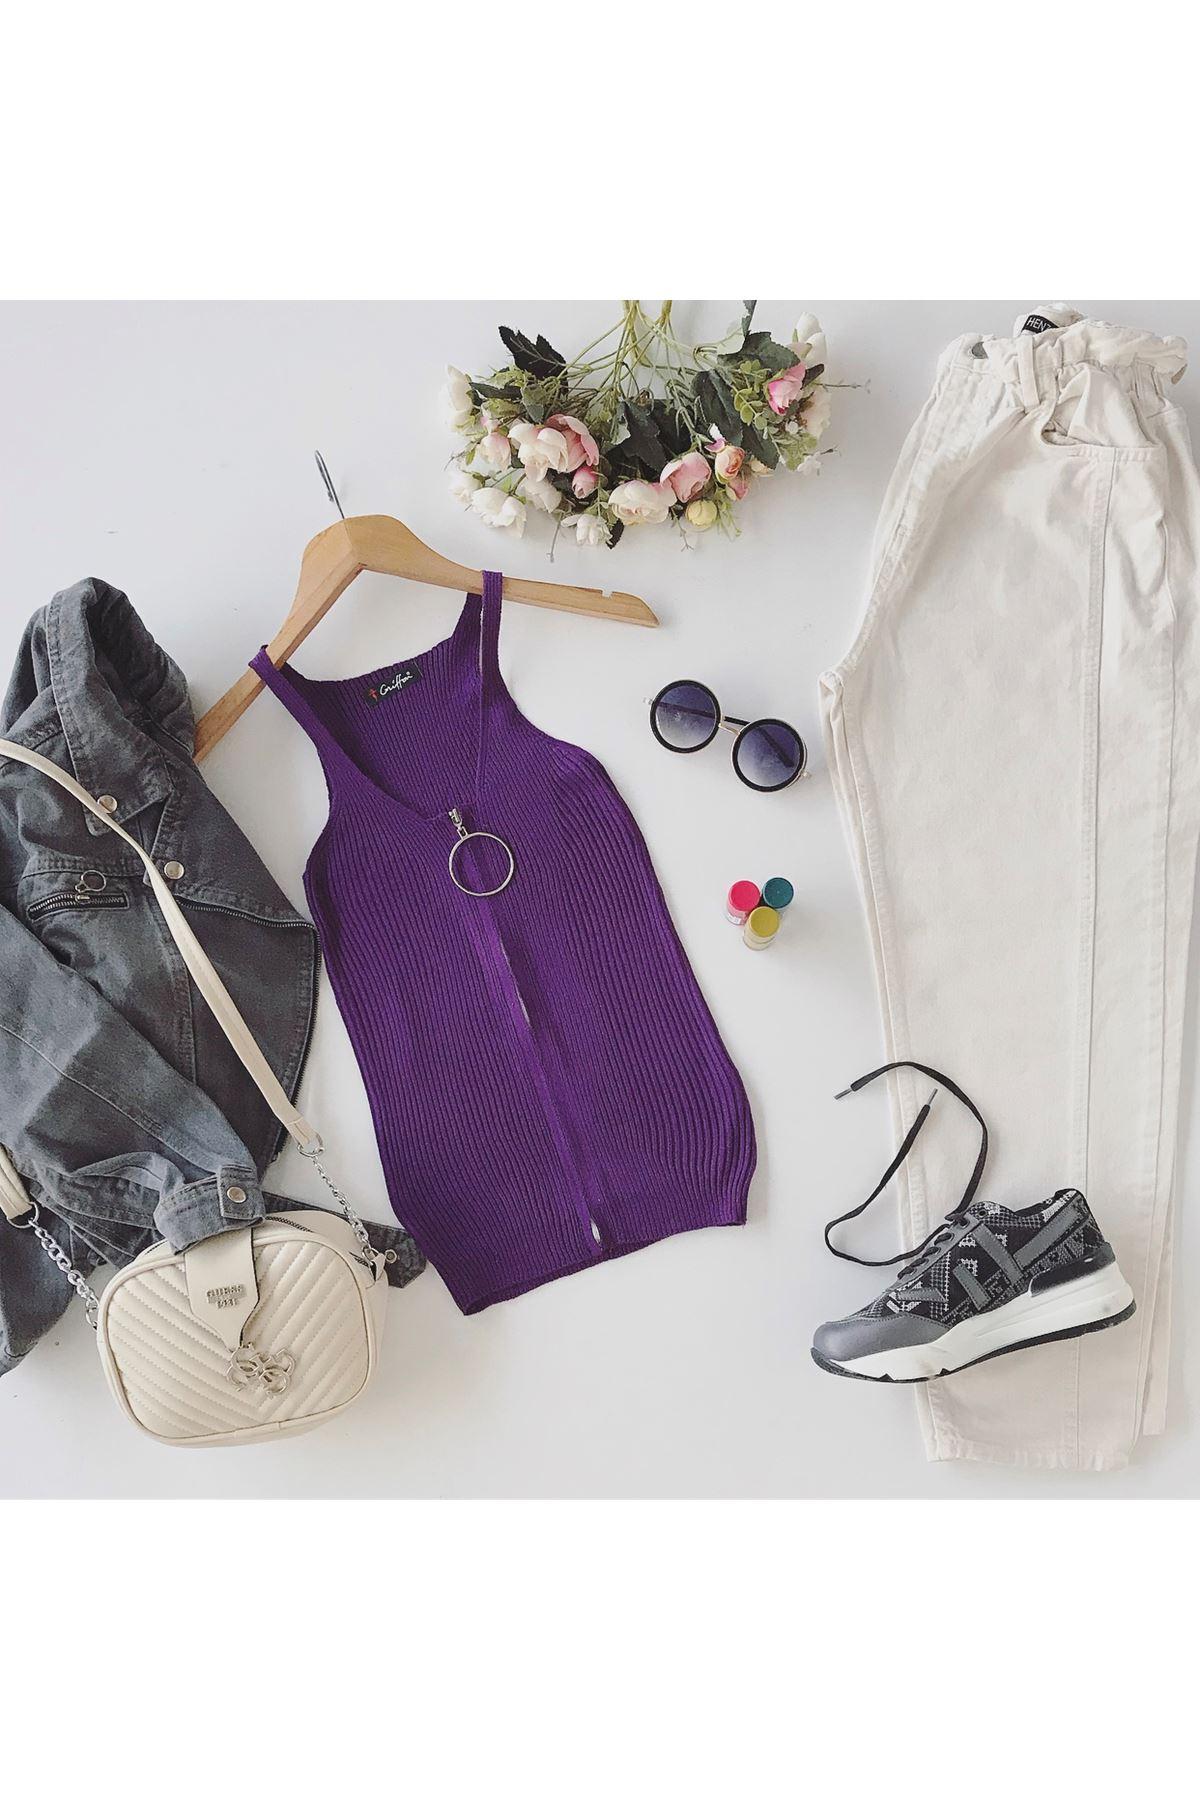 Women's Zipped Purple Tricot Blouse